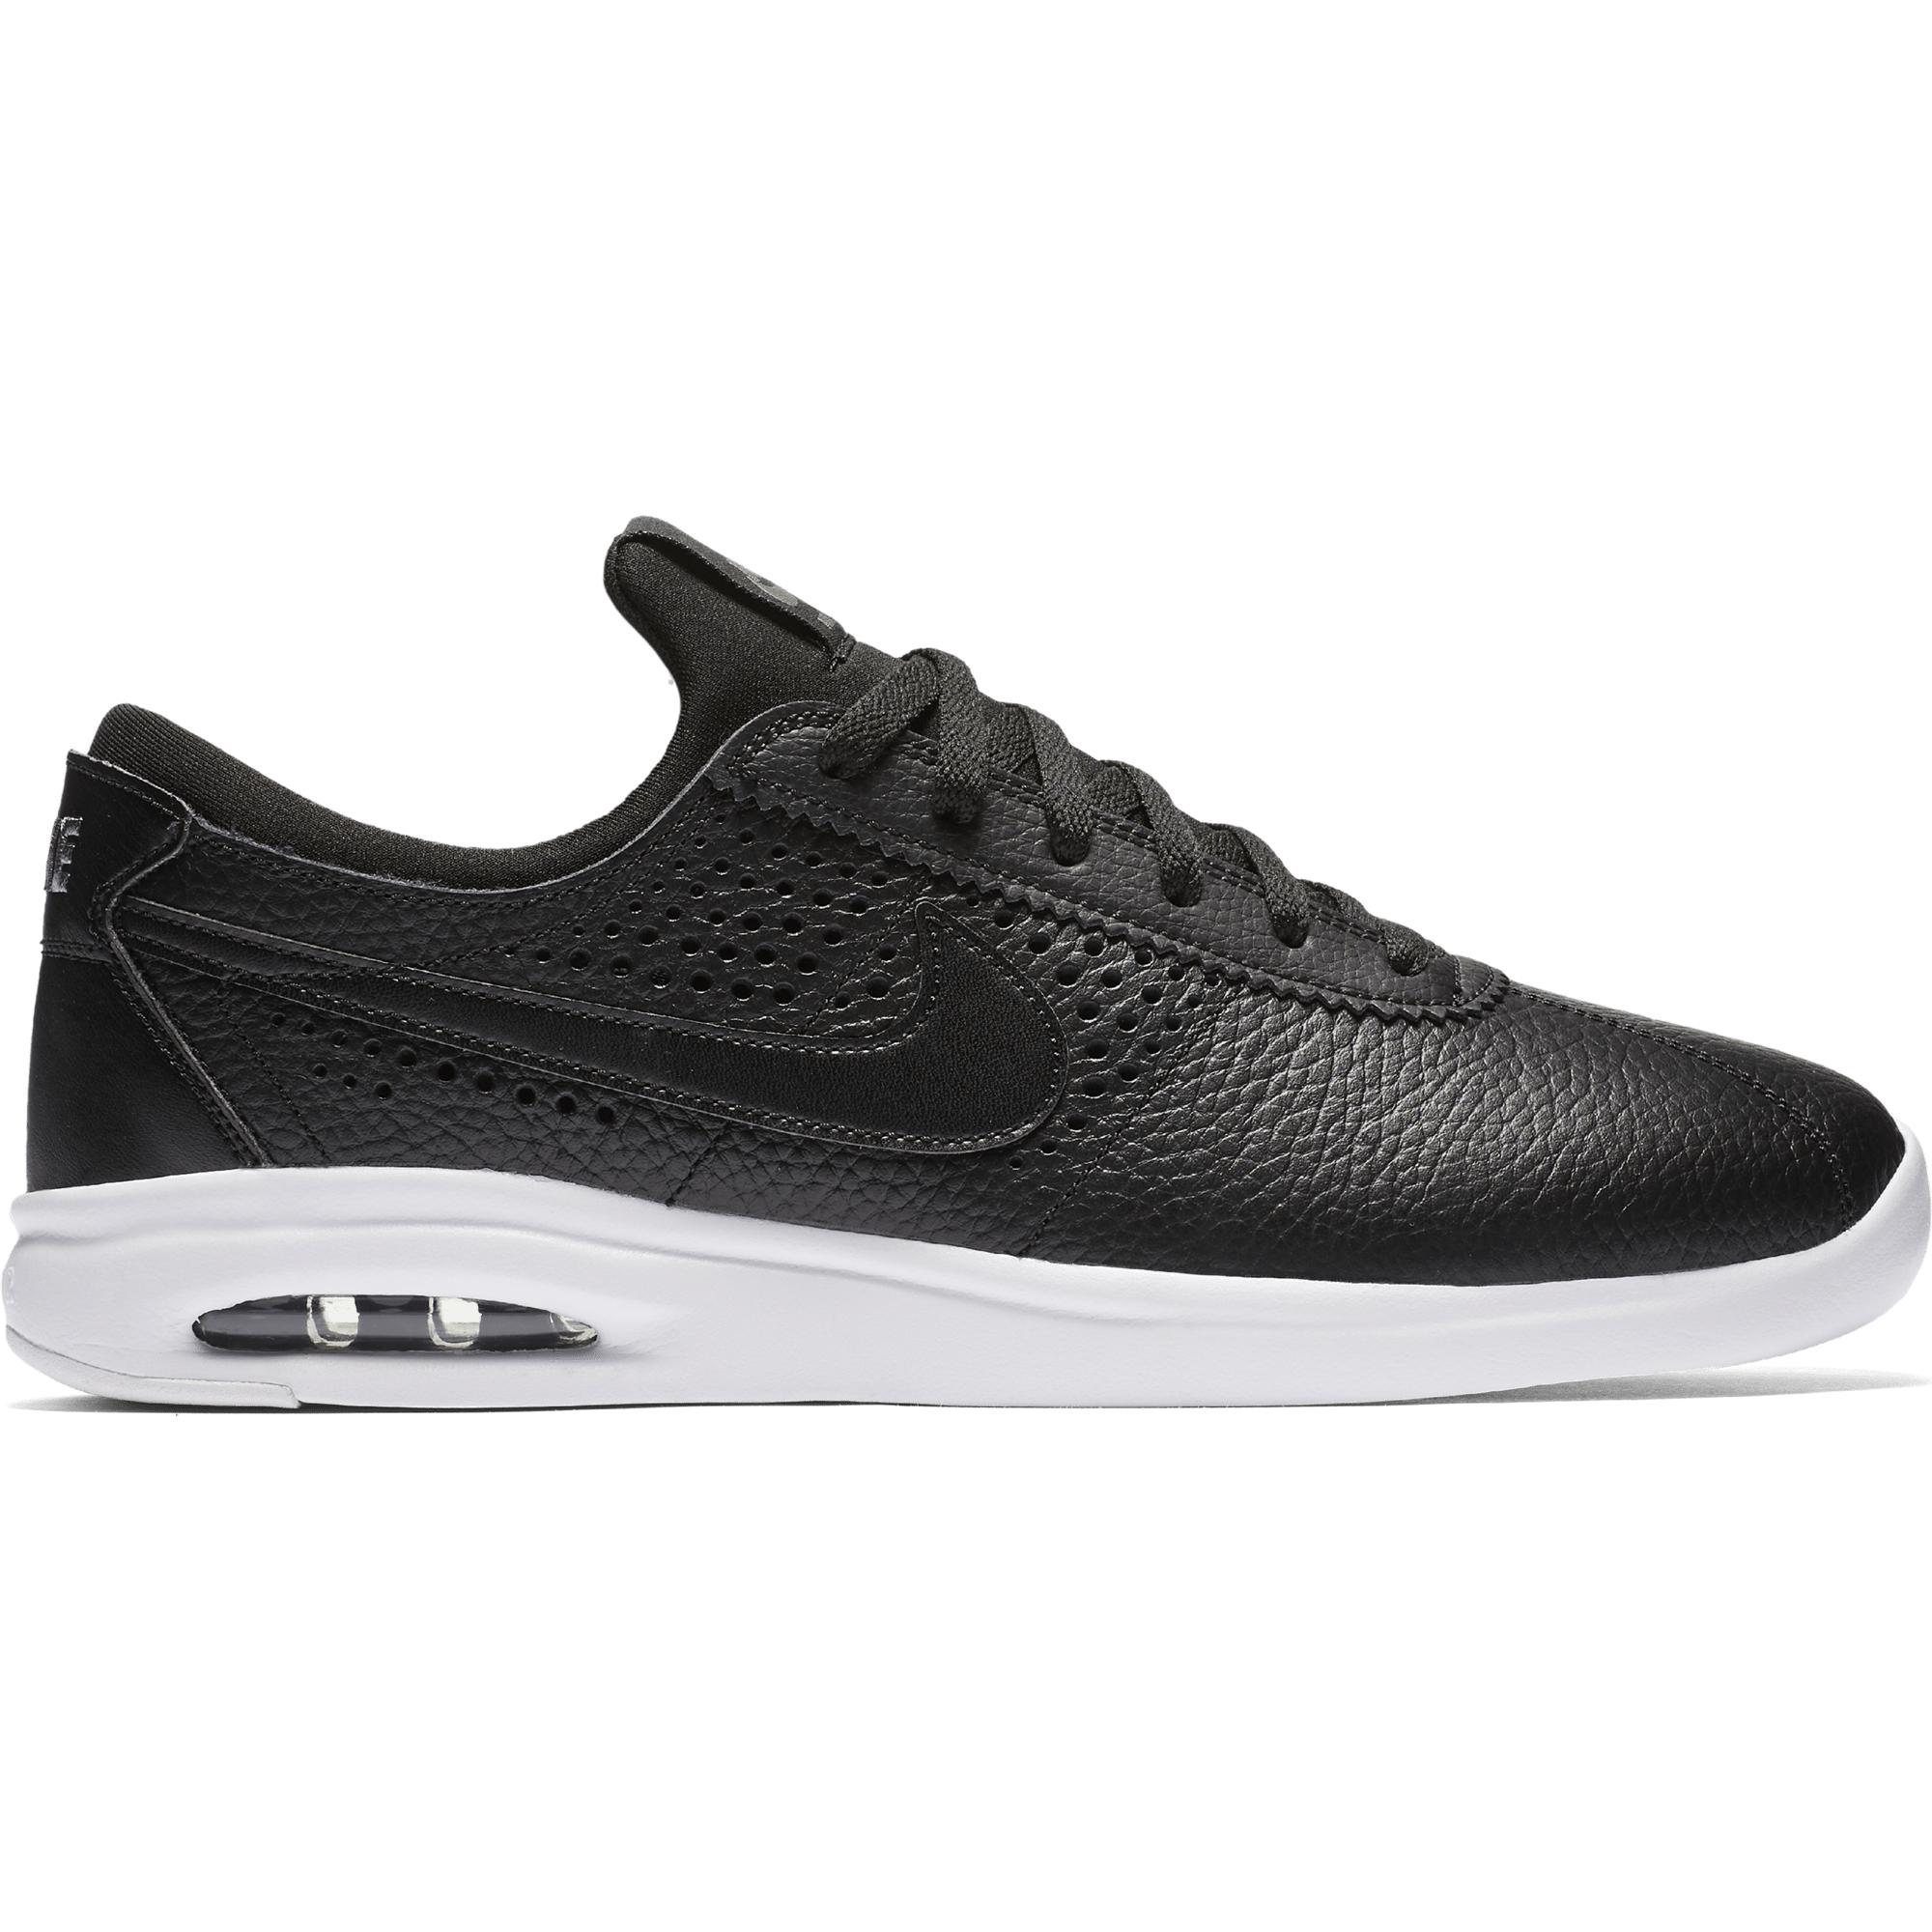 Nike SB bruin vapor skate shoes - Black £99.95 @ skate hut.